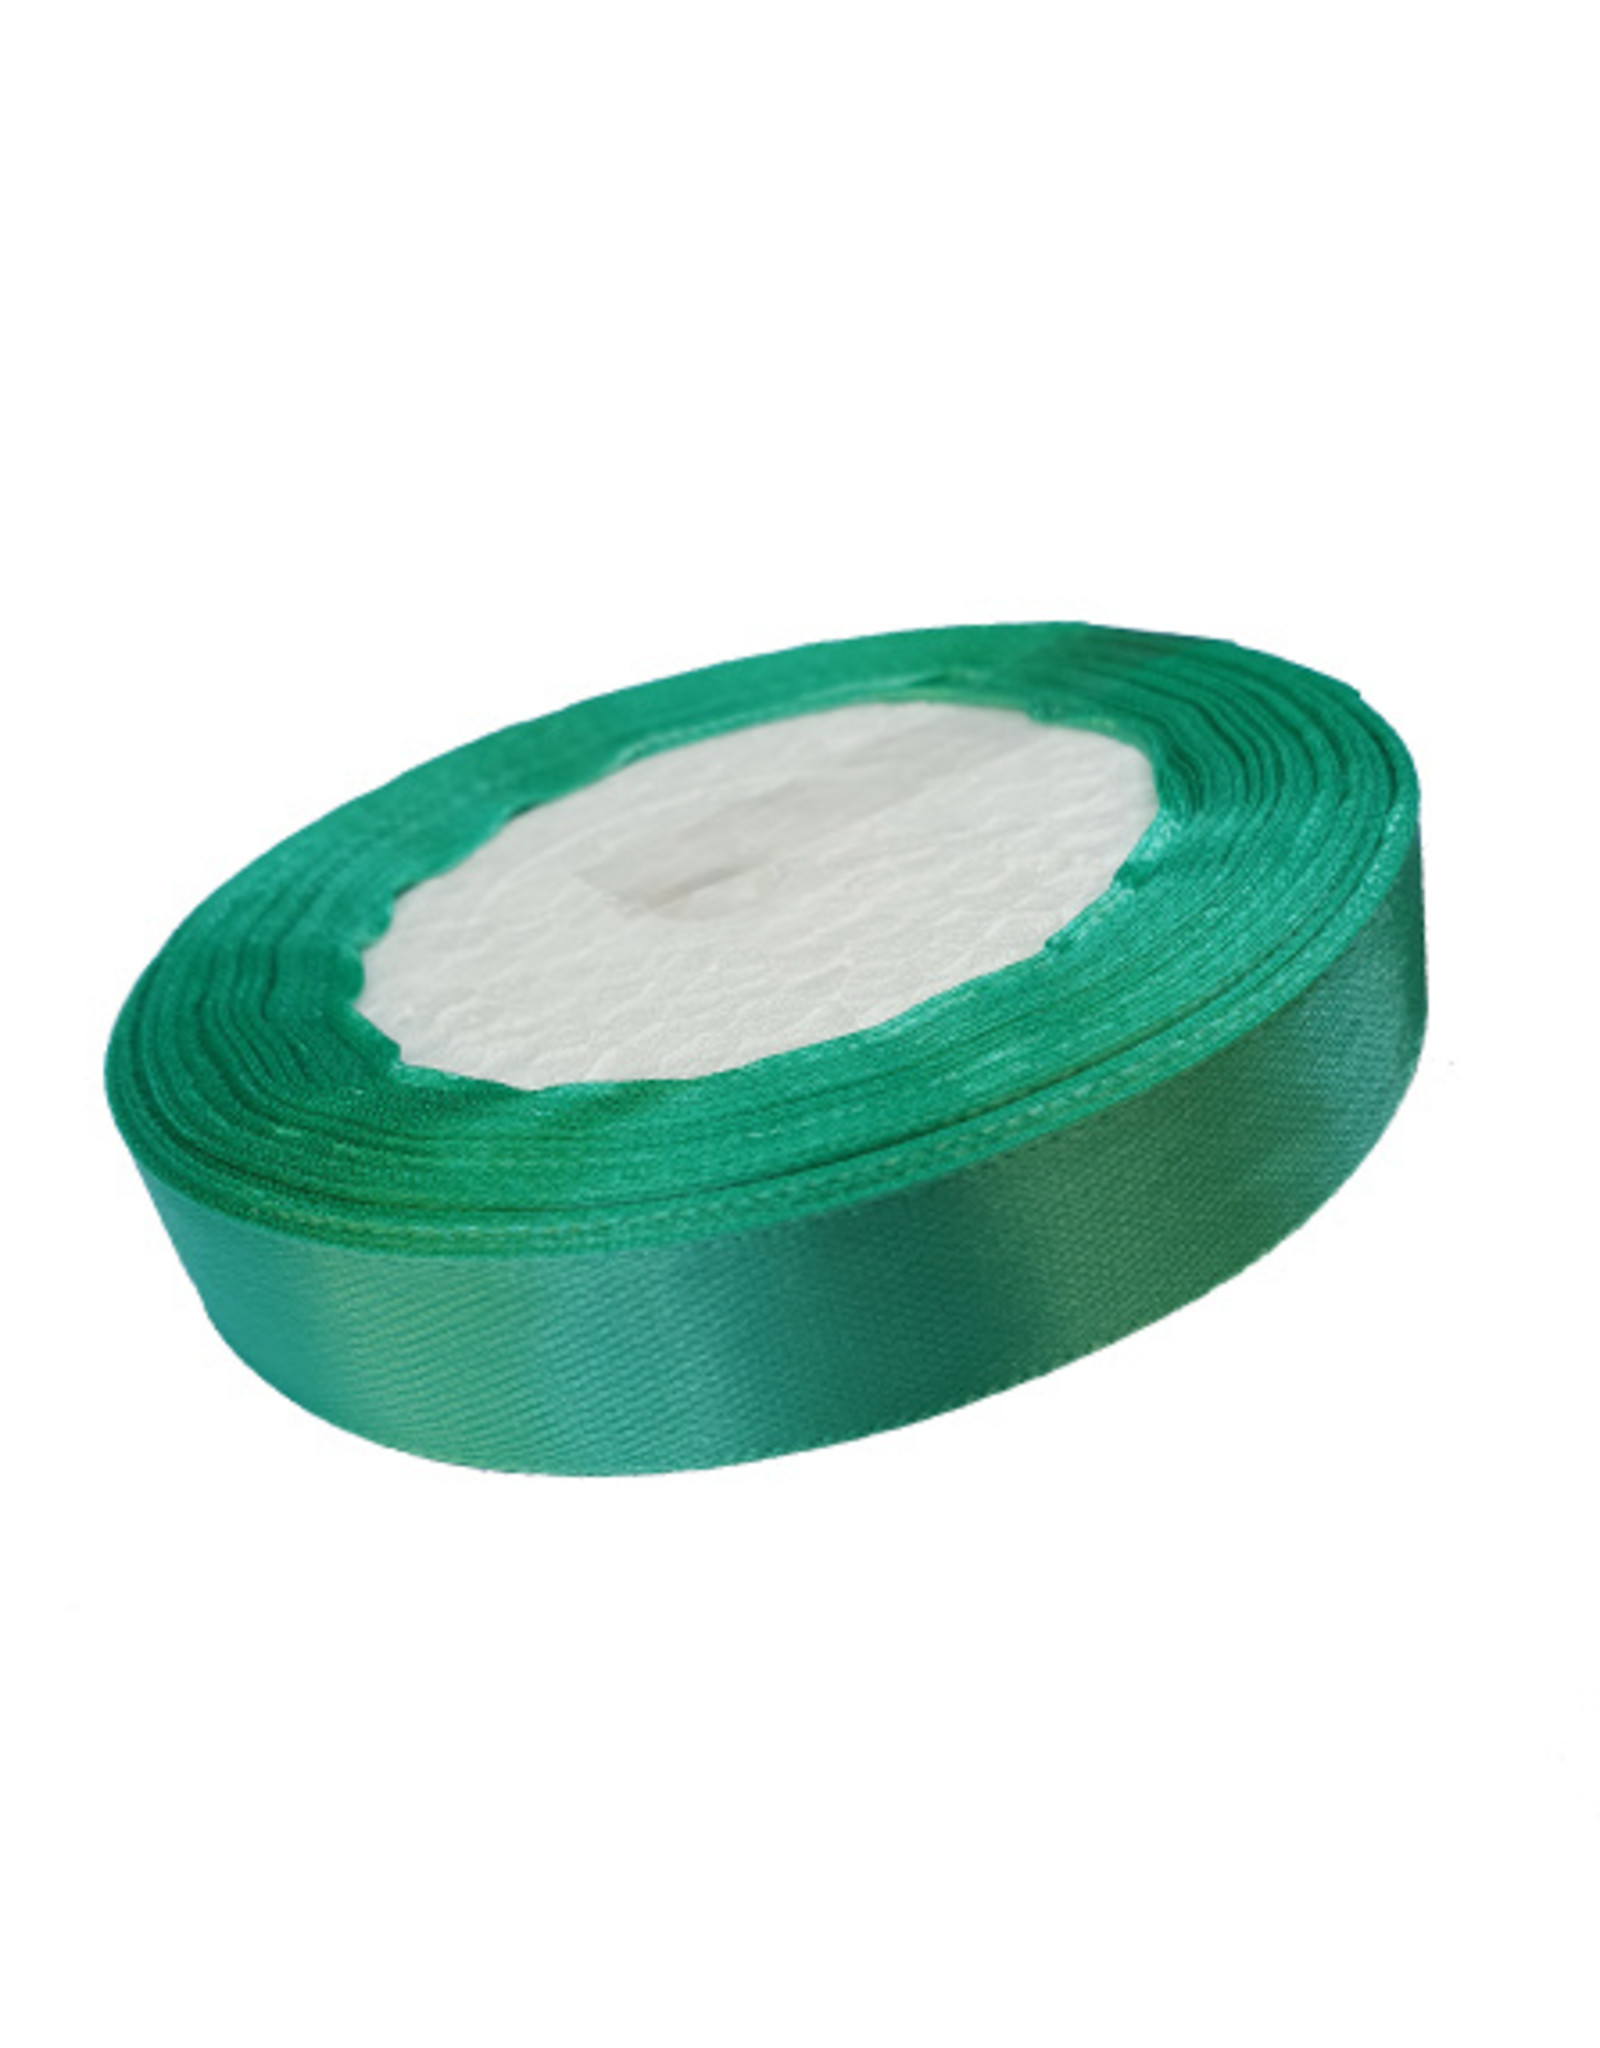 Satin ribbon - Turquoise